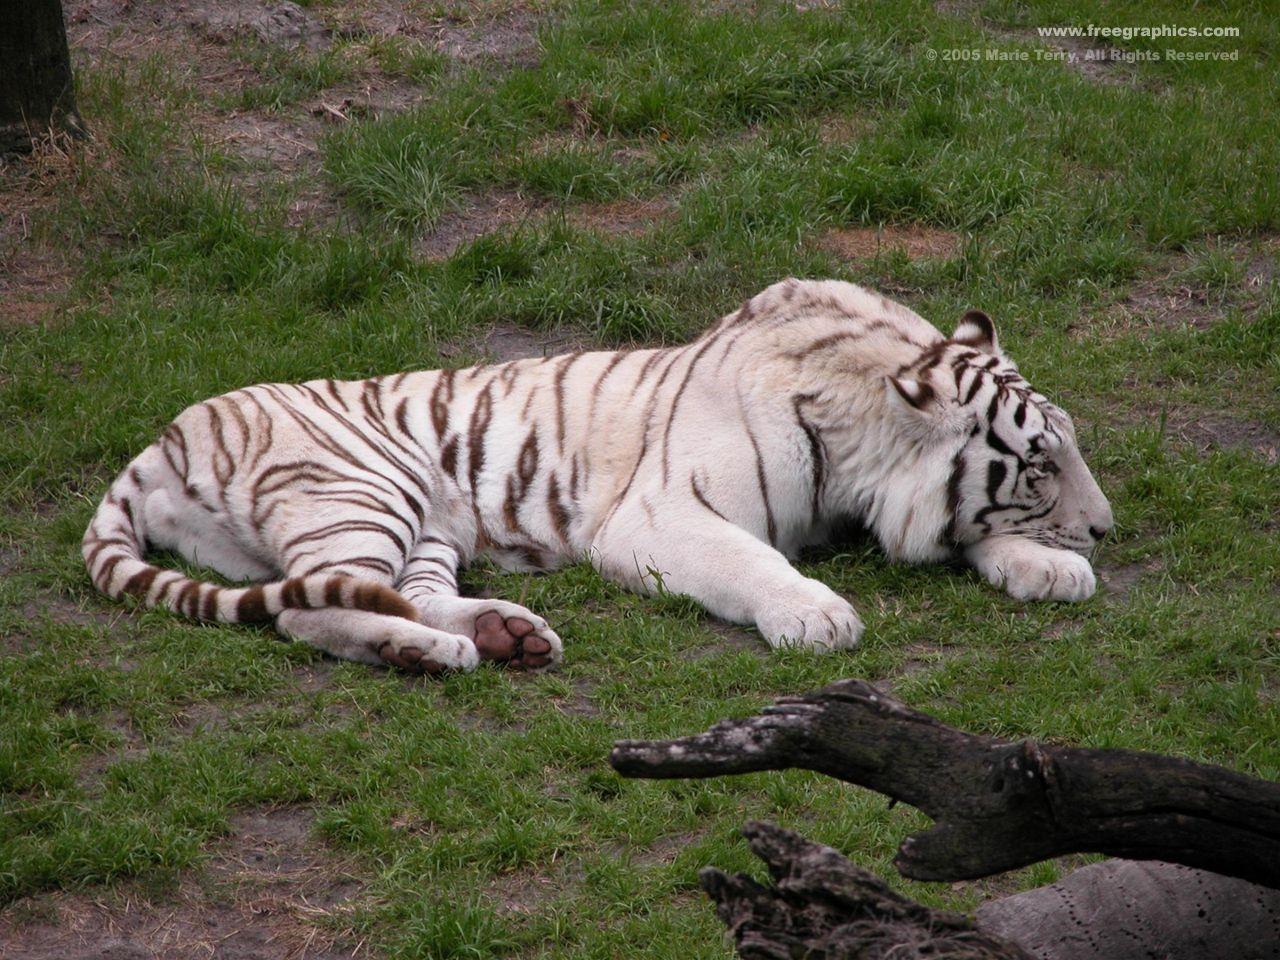 Jungle Animals Tigers White Tiger Hd Wallpaper Free Picture